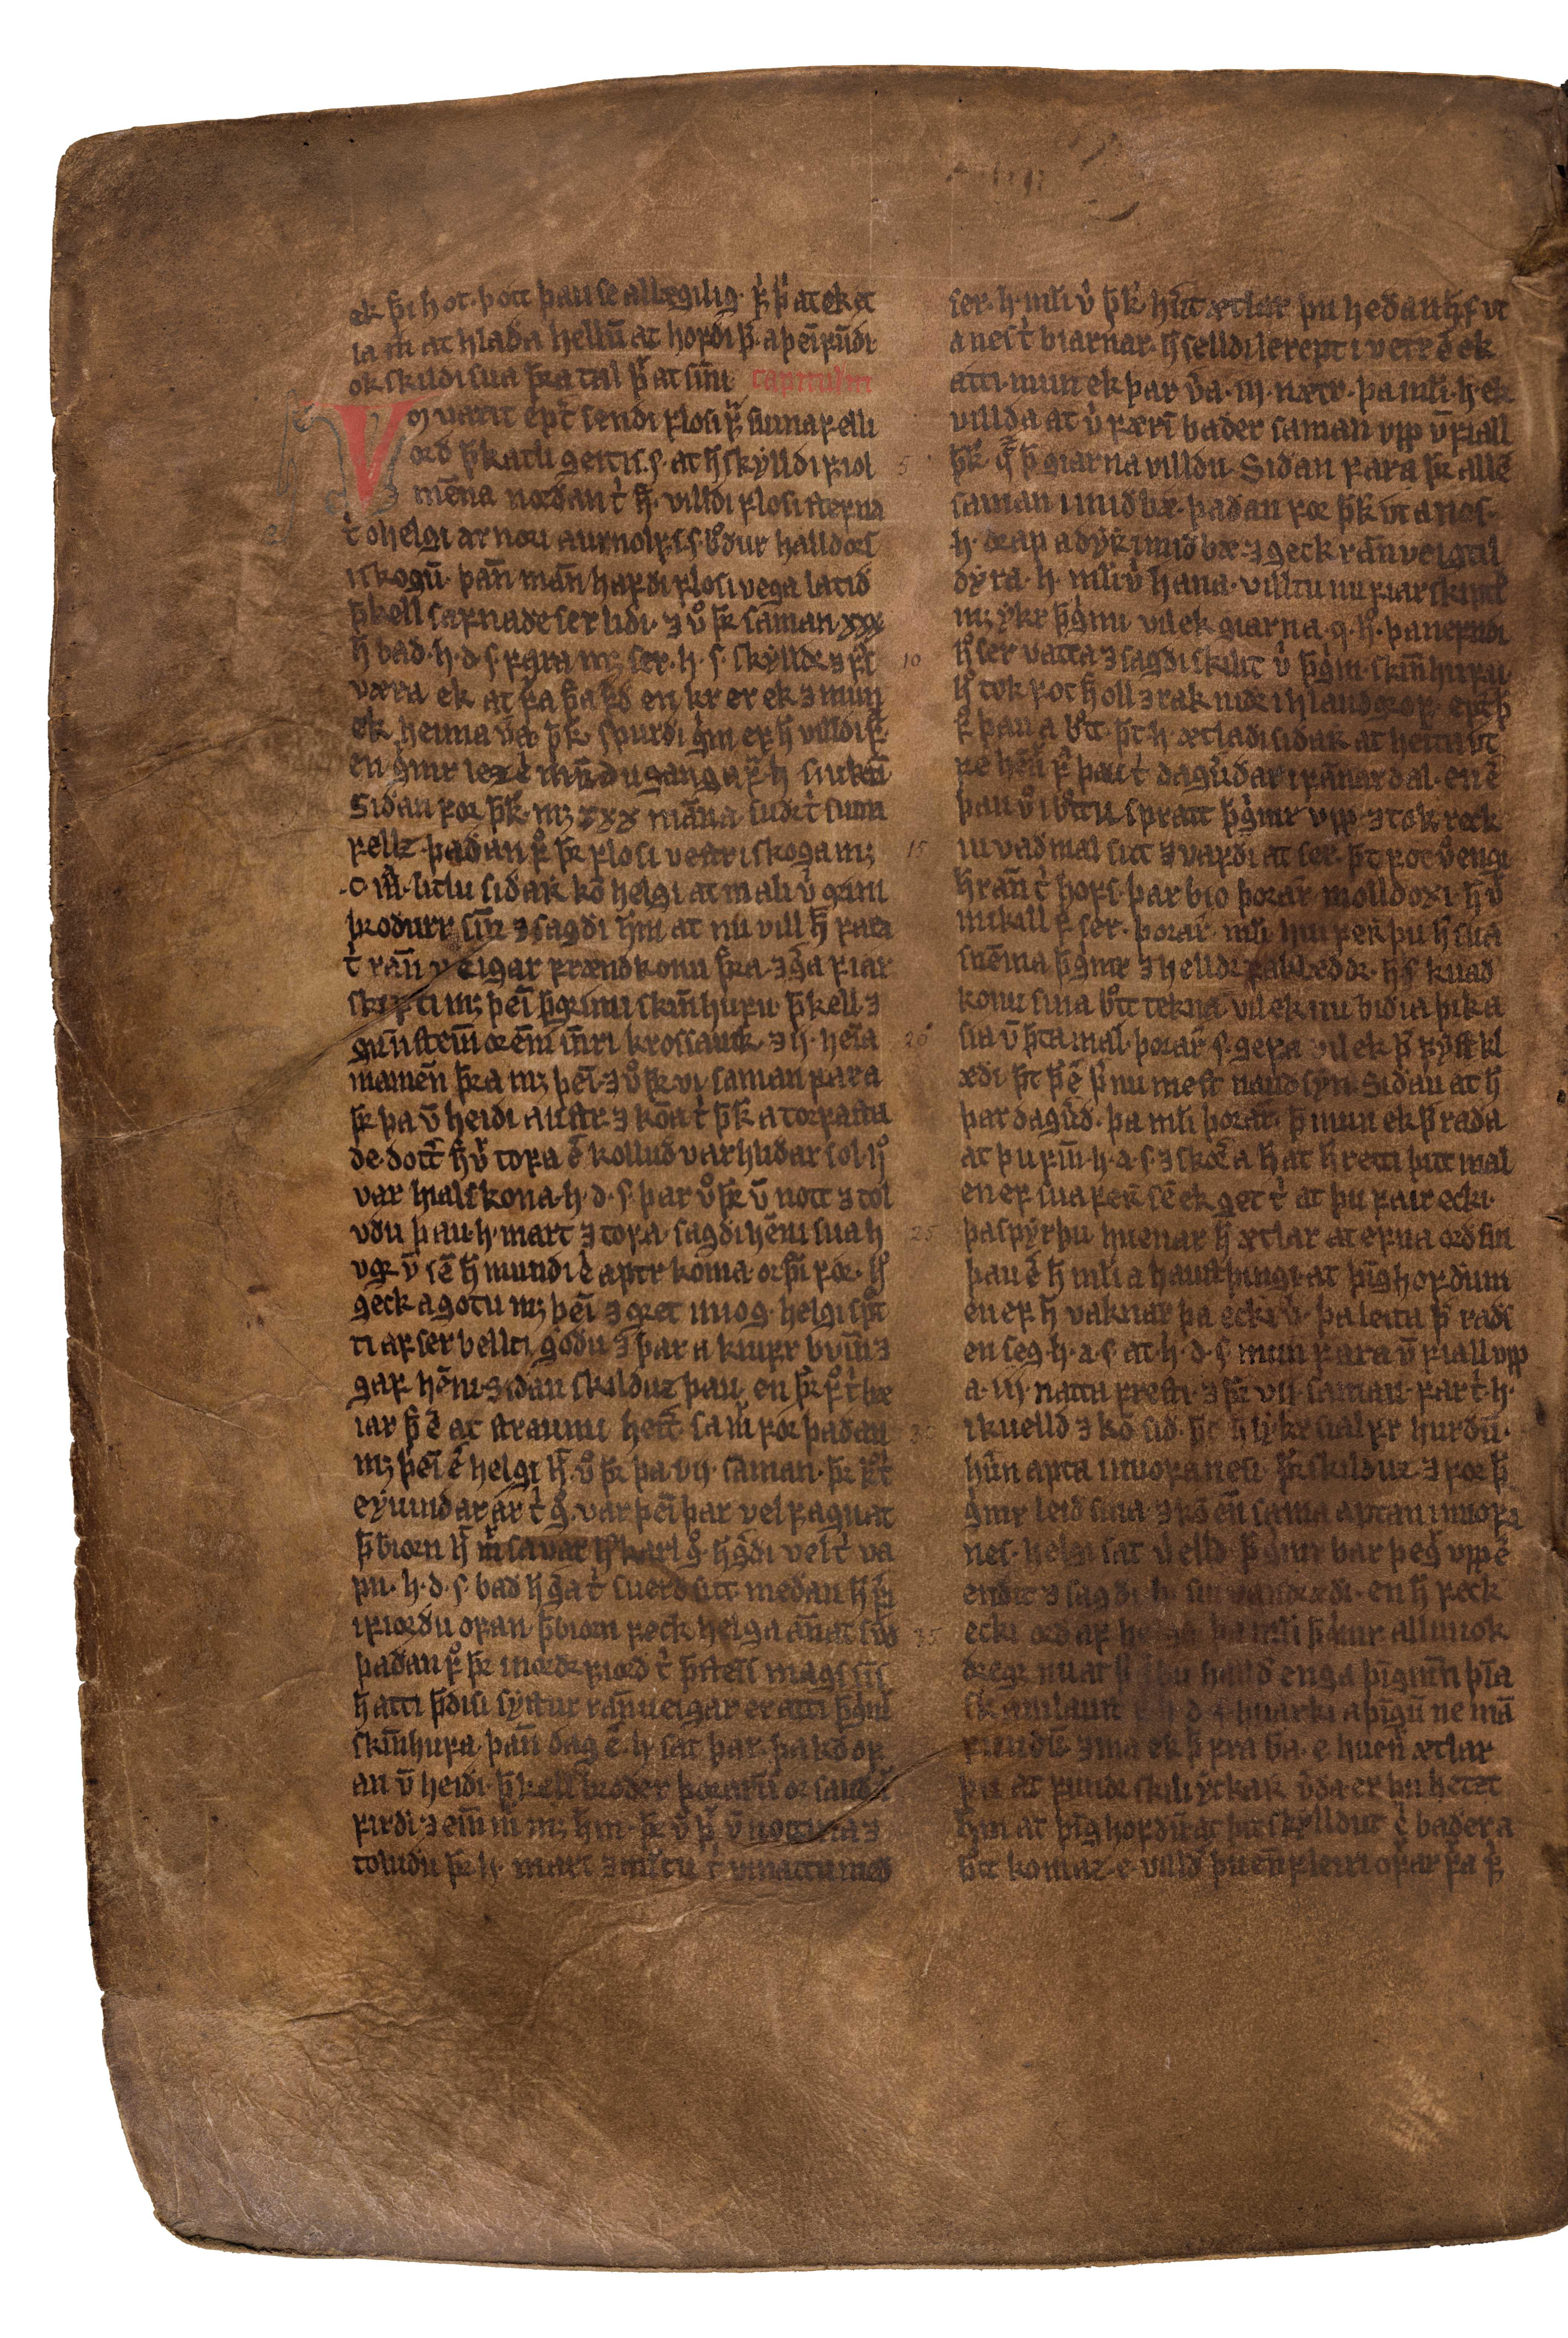 AM 132 fol - 144v